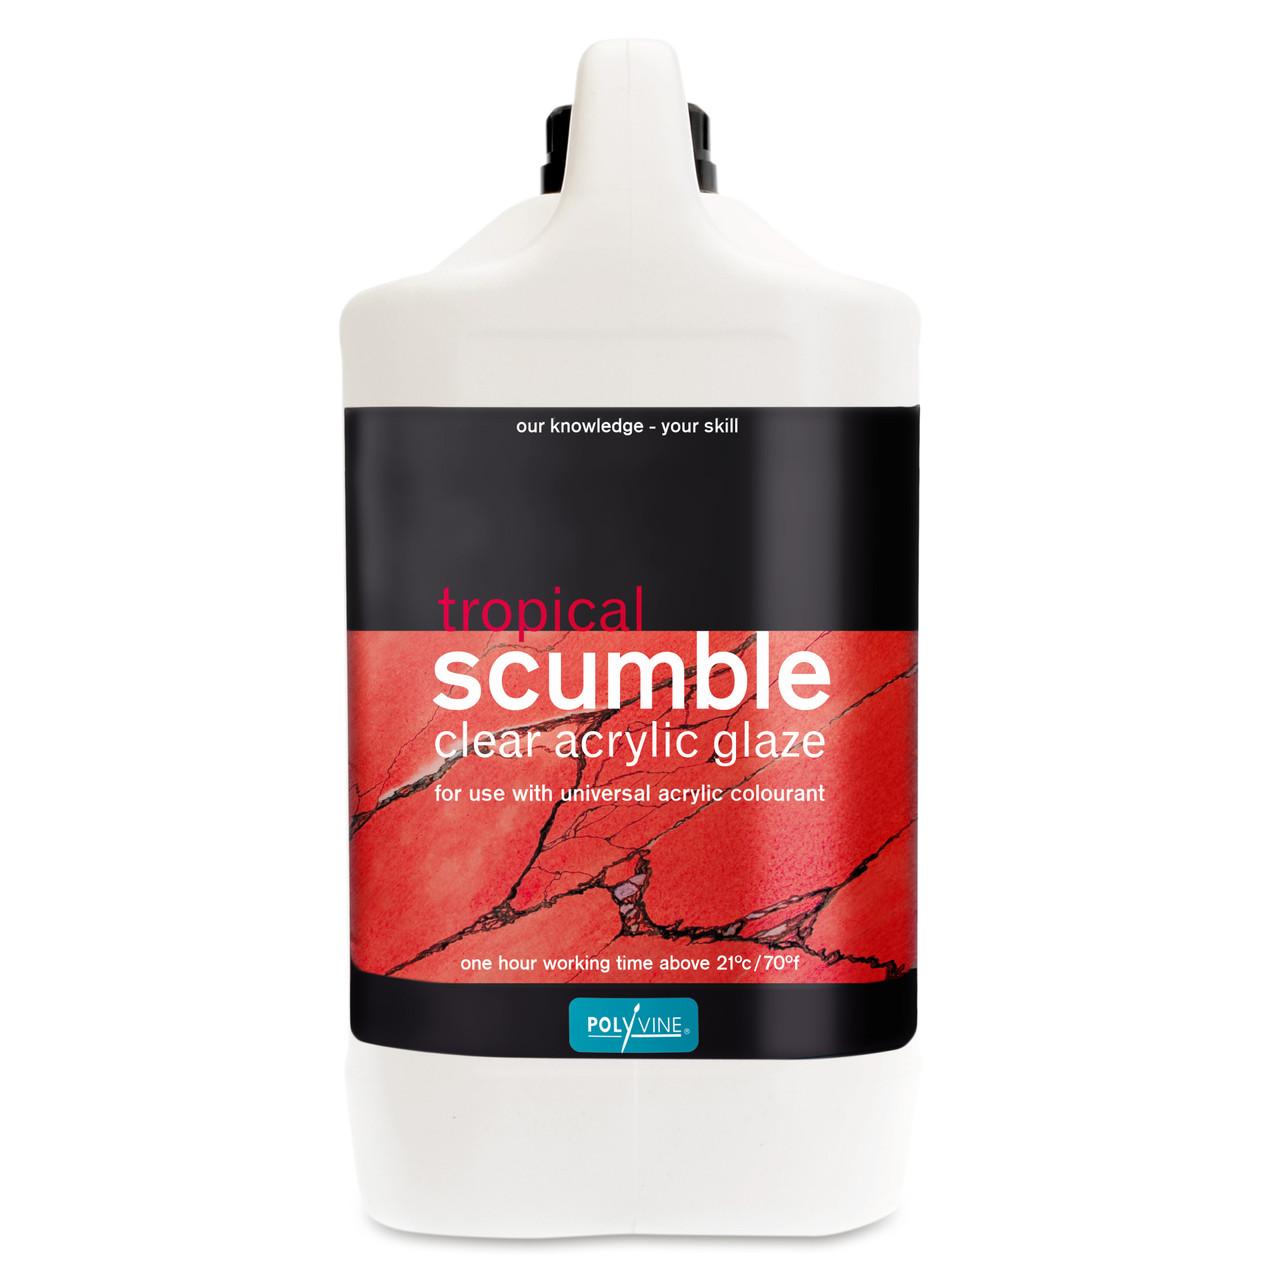 Polyvine Tropical Scumble Glaze